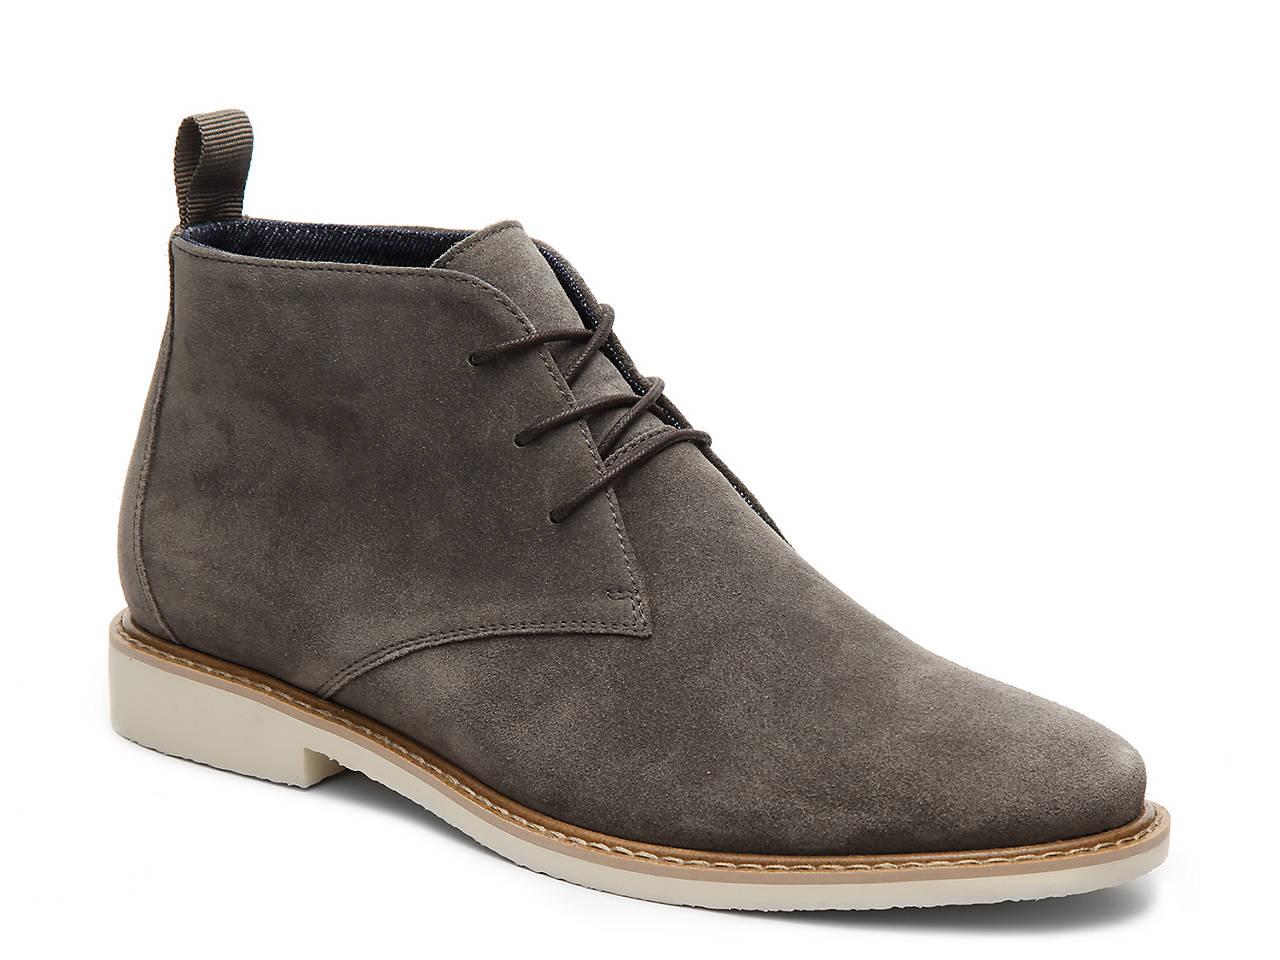 90bba020d9 Aldo Lubba Chukka Boot Men's Shoes | DSW